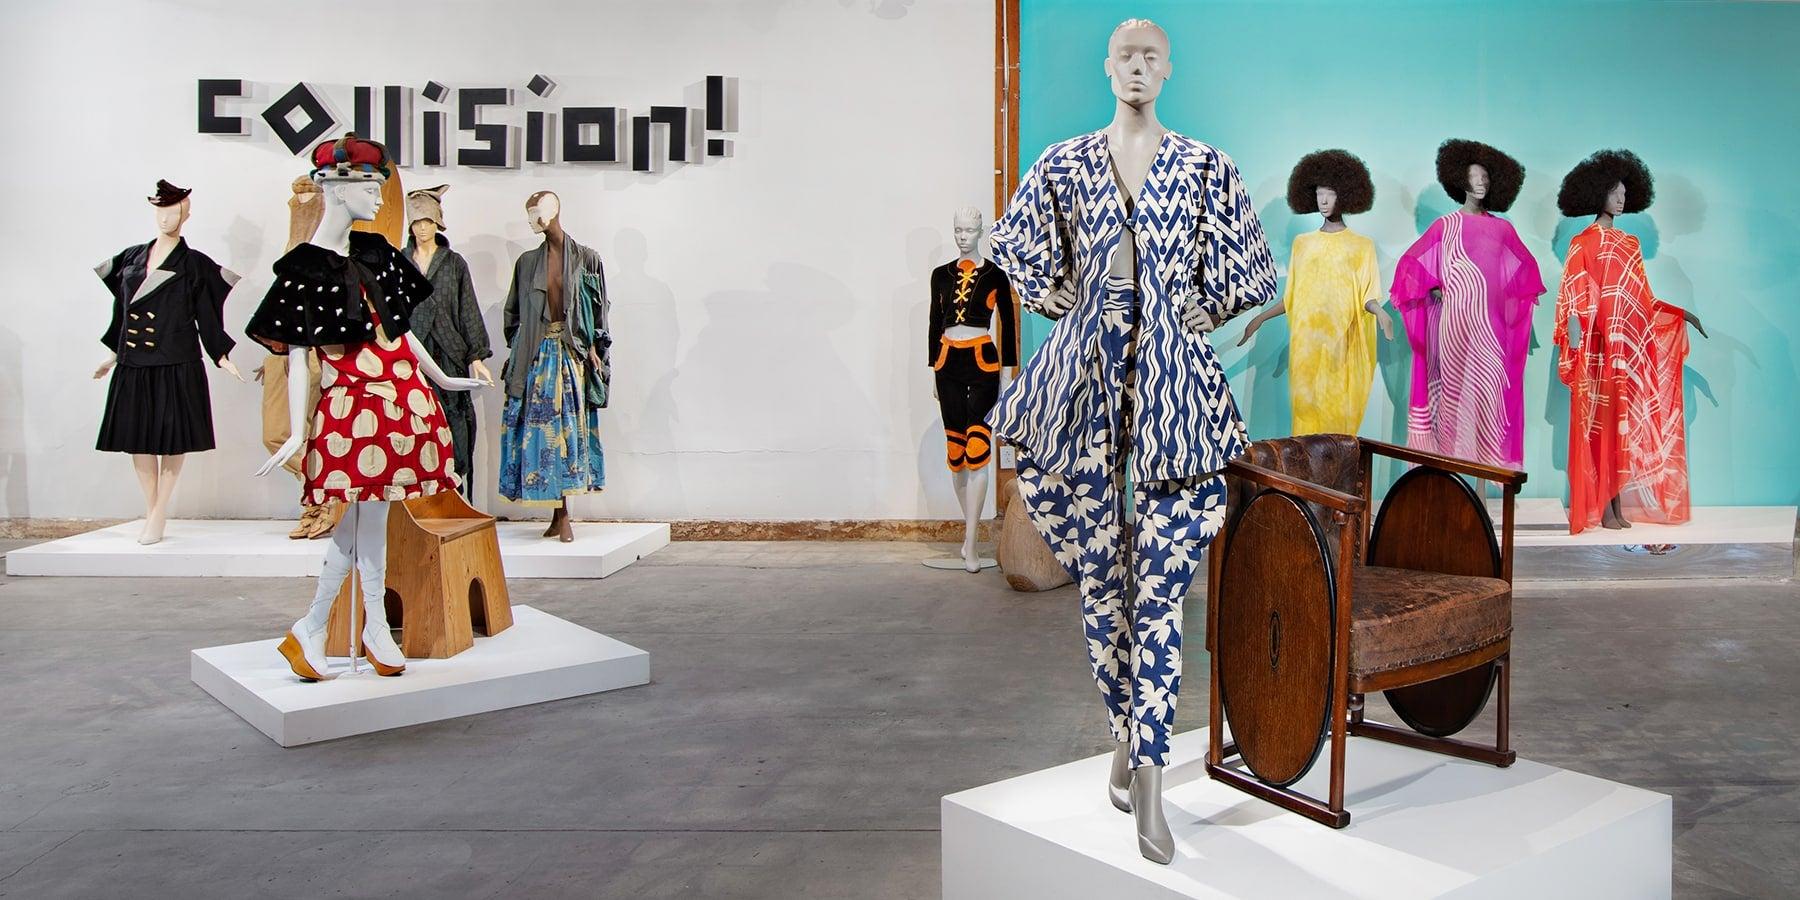 JF Chenu0027s U0027Collisionu0027 Combines High Fashion And Haute Furniture